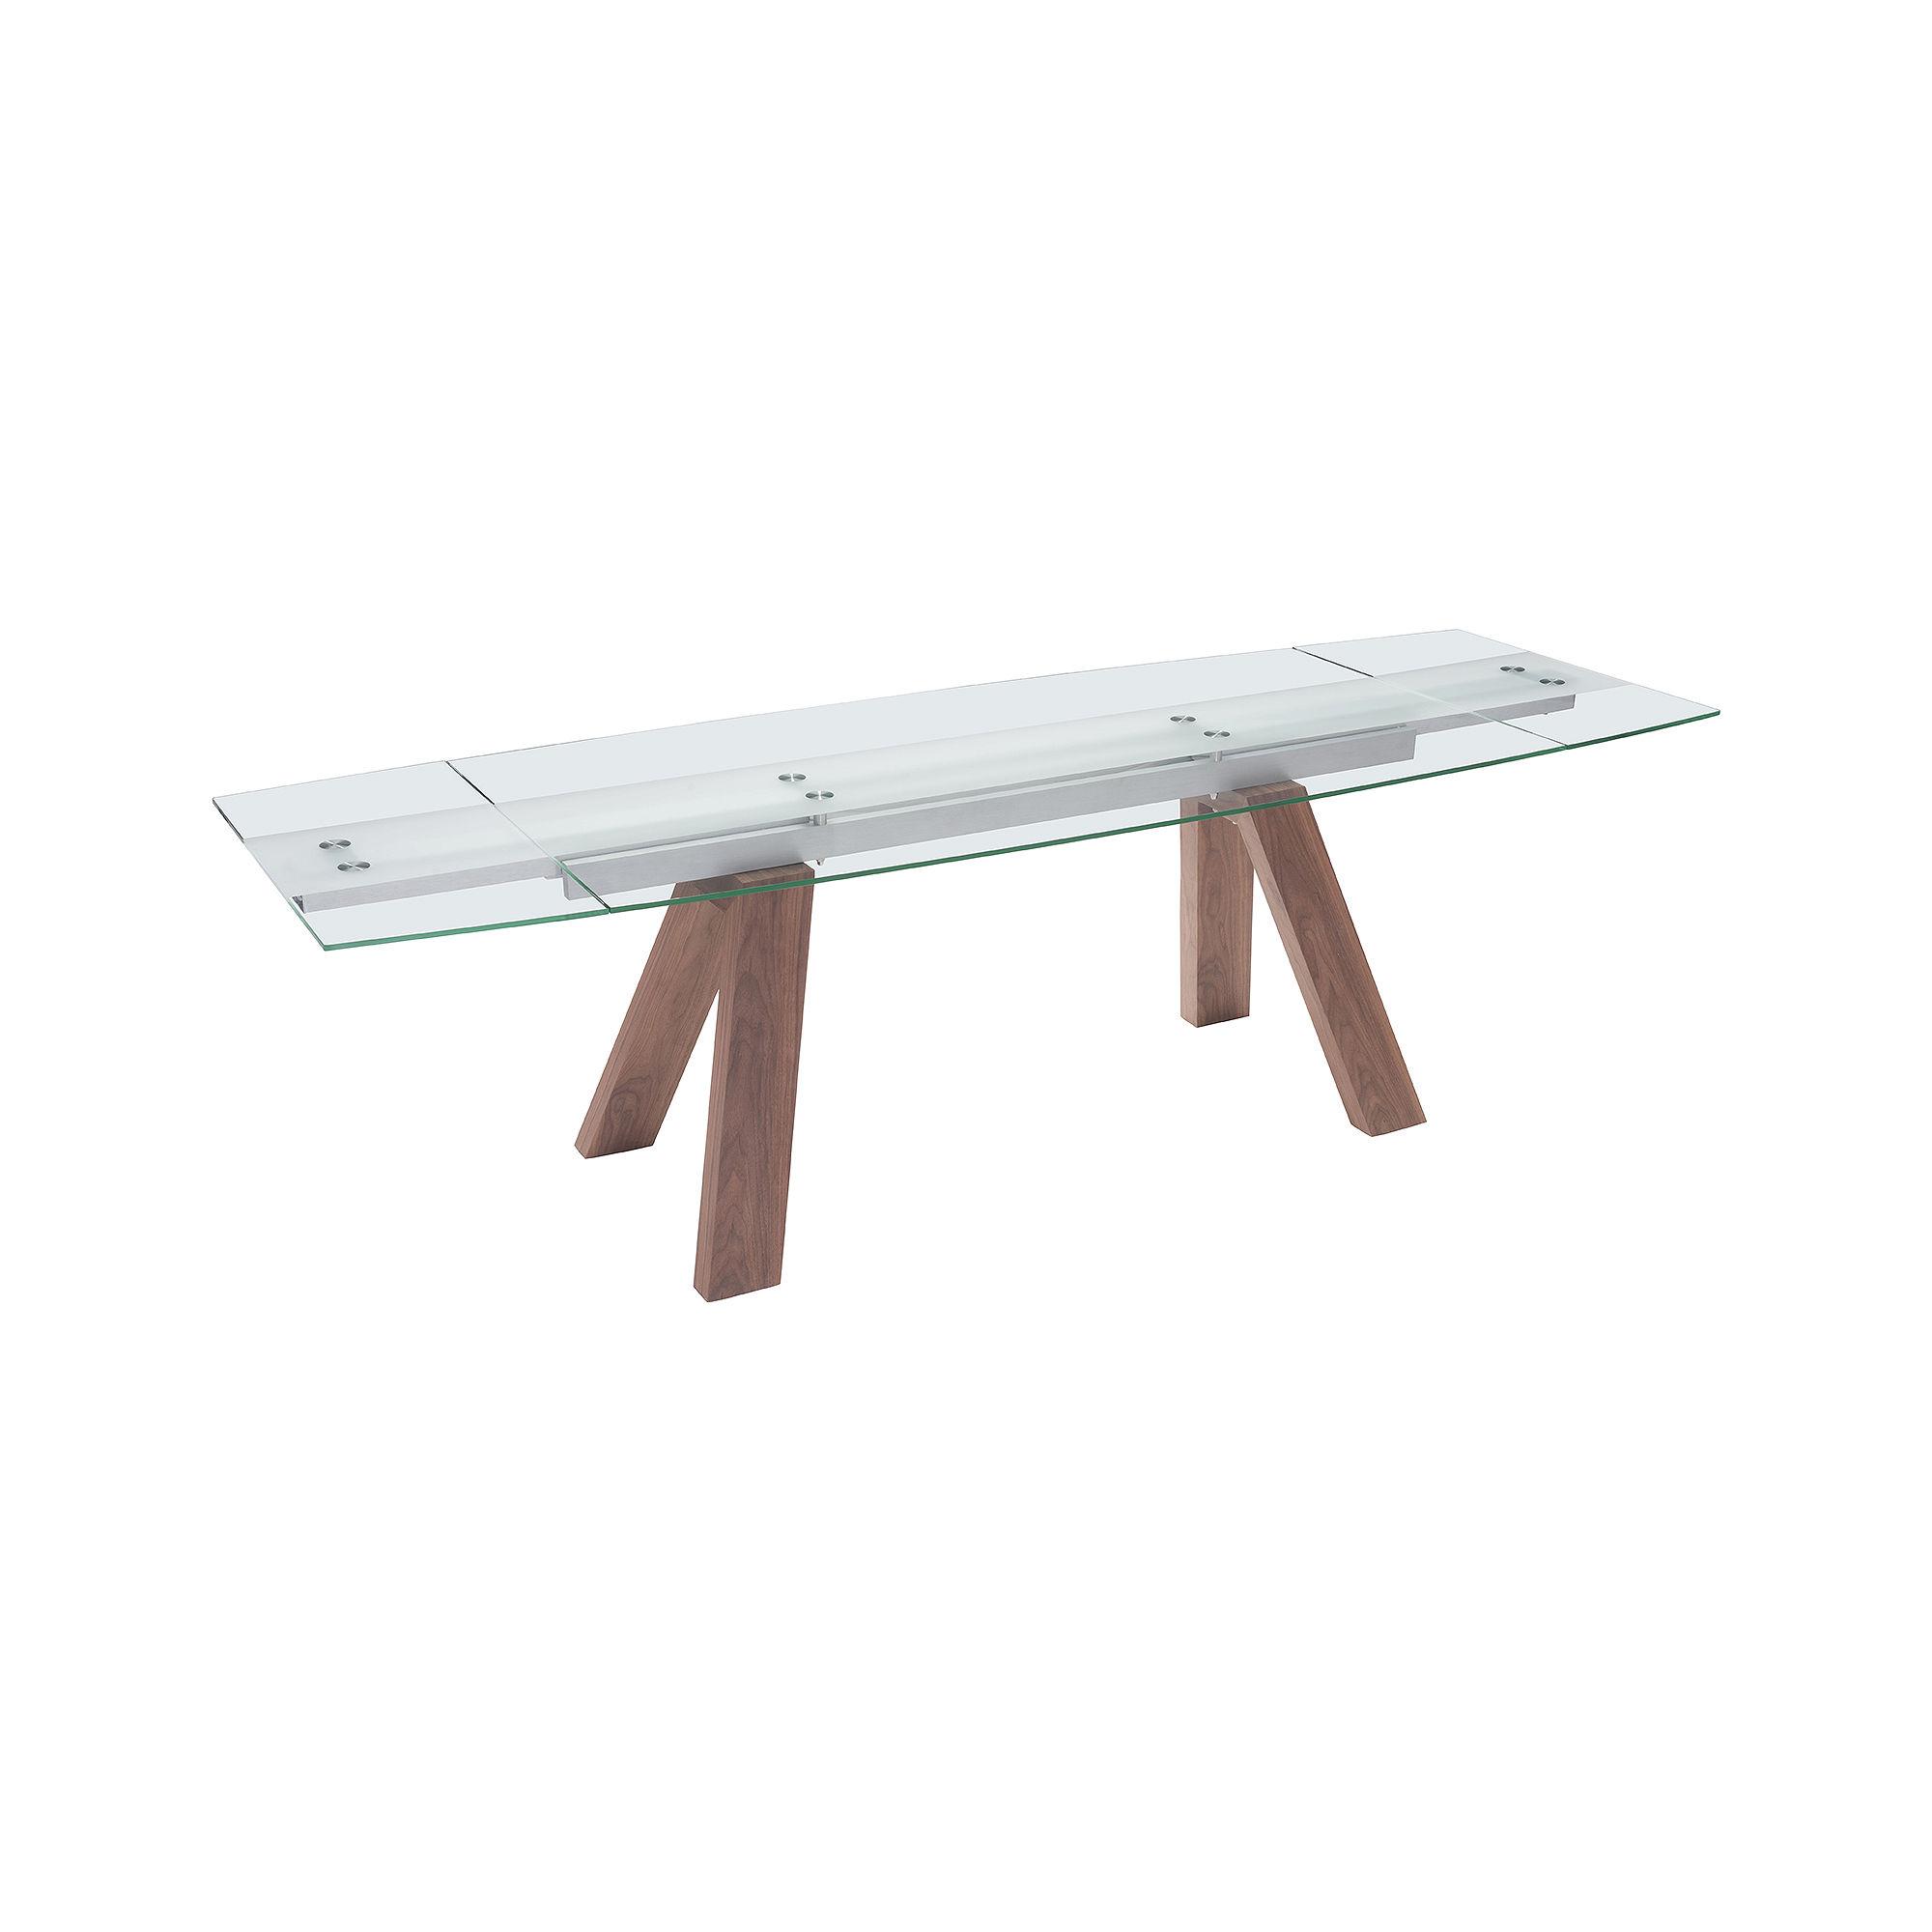 Zuo Modern Wonder Extension Rectangular Dining Table